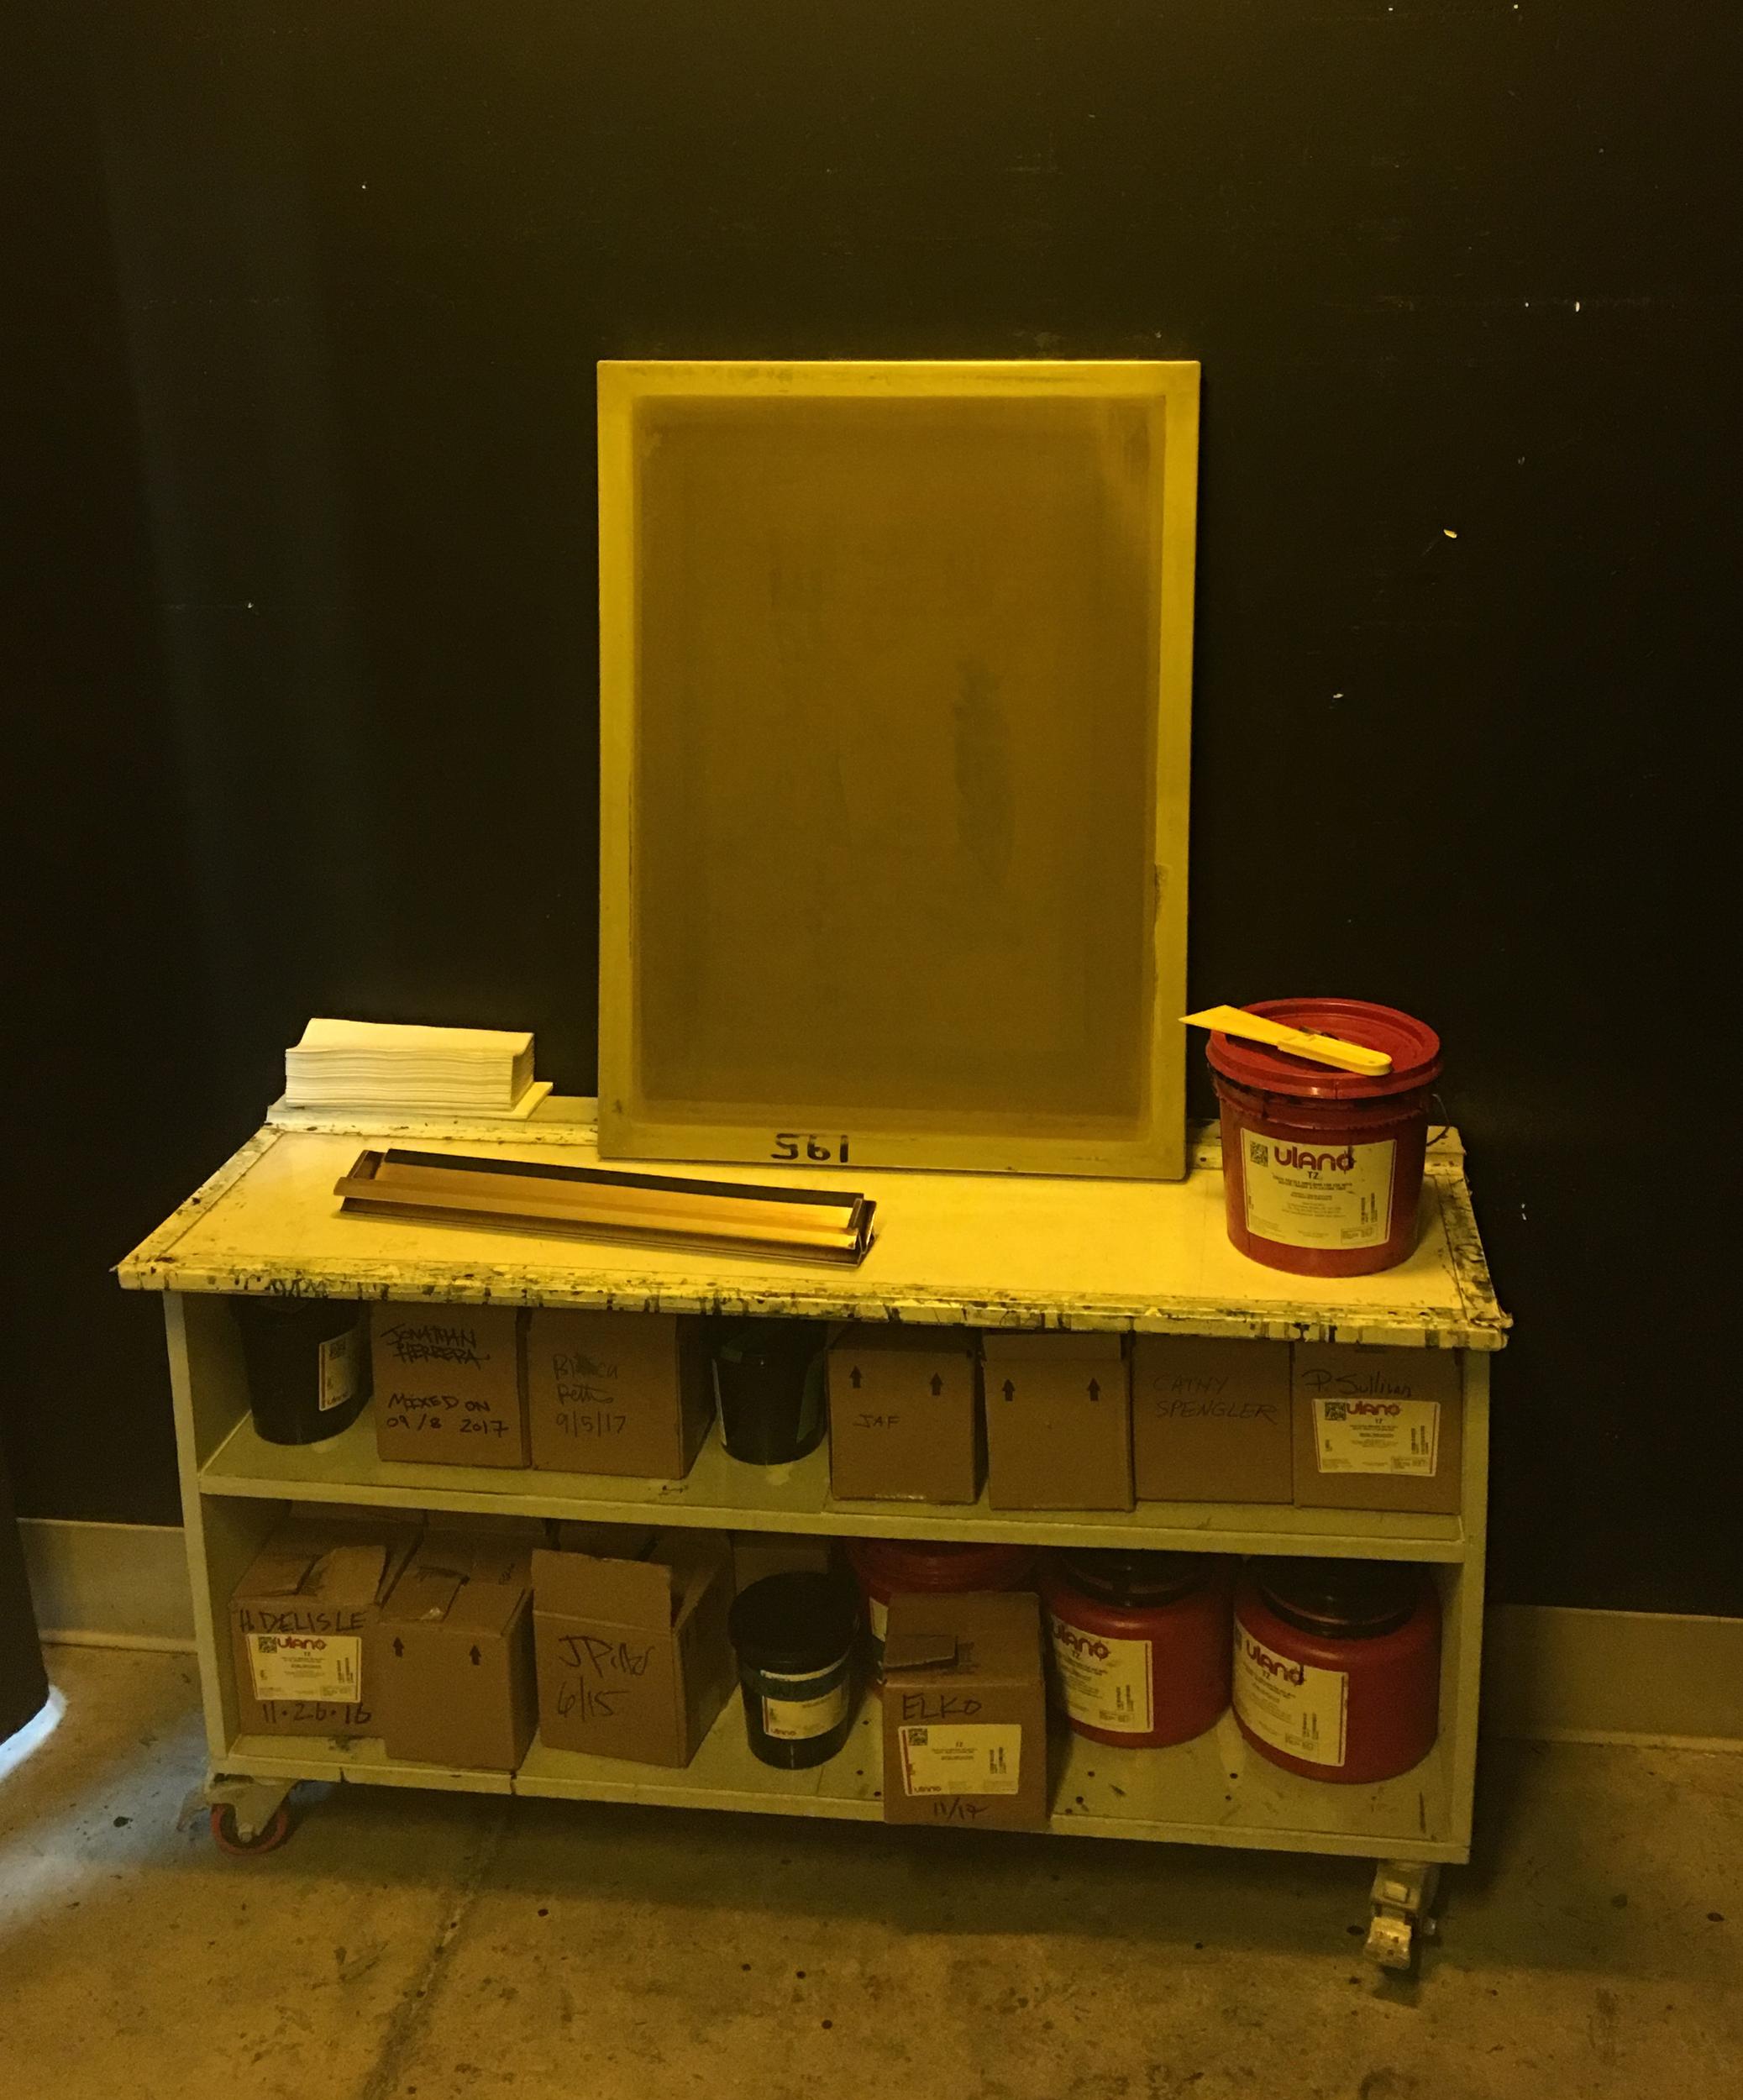 Emulsion coating station